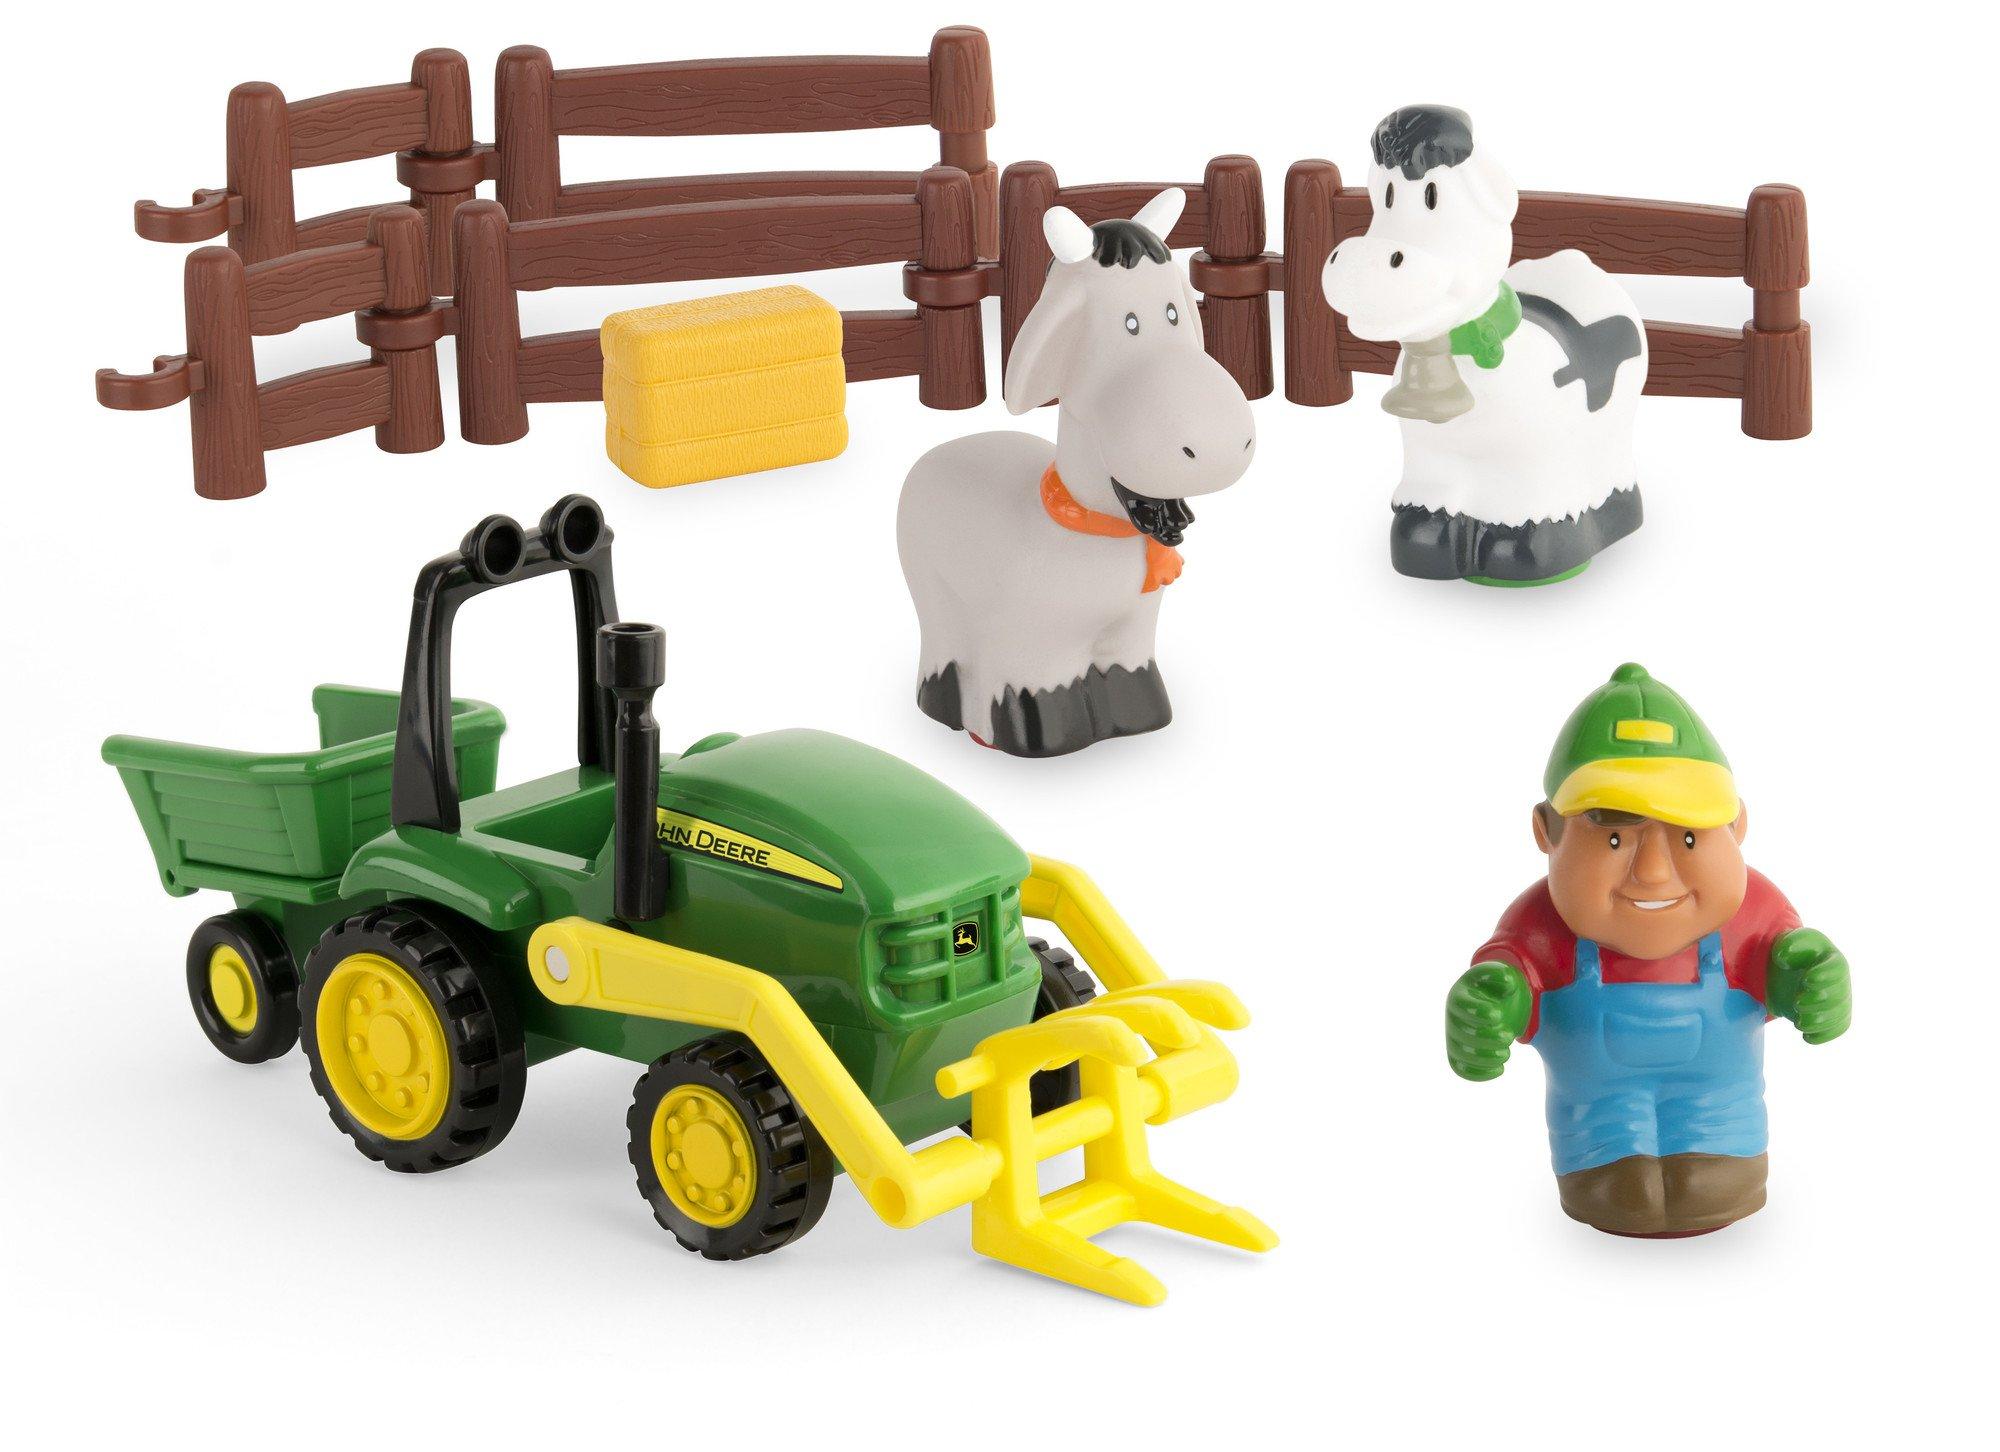 TOMY John Deere 1st Farming Fun, Load-Up Playset